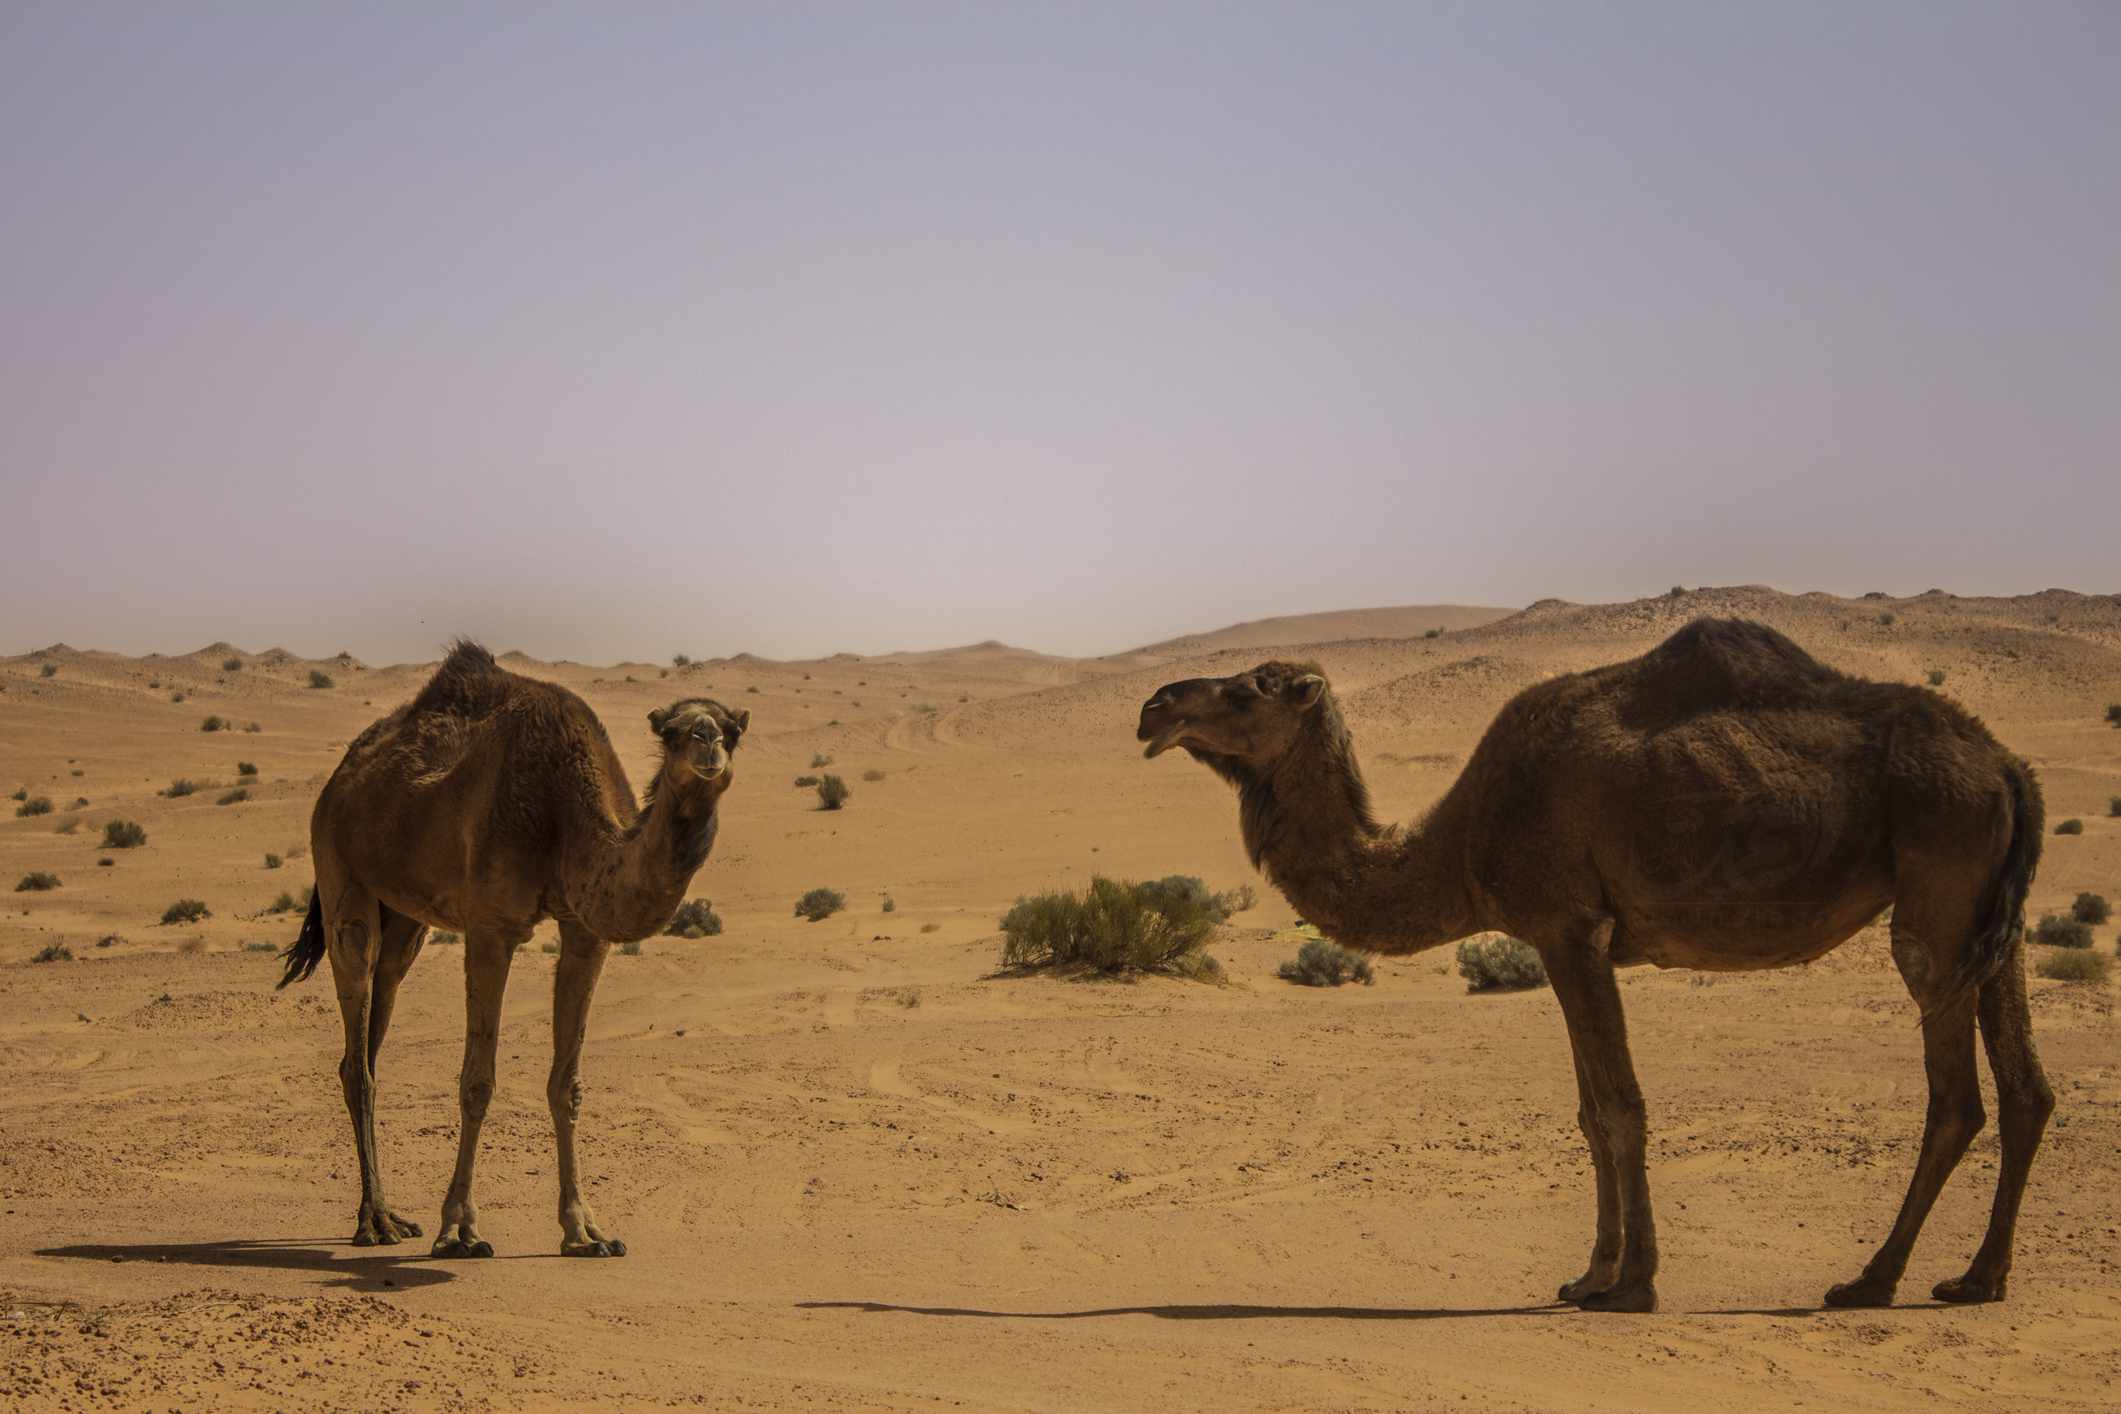 Pair of dromedary camels in the desert